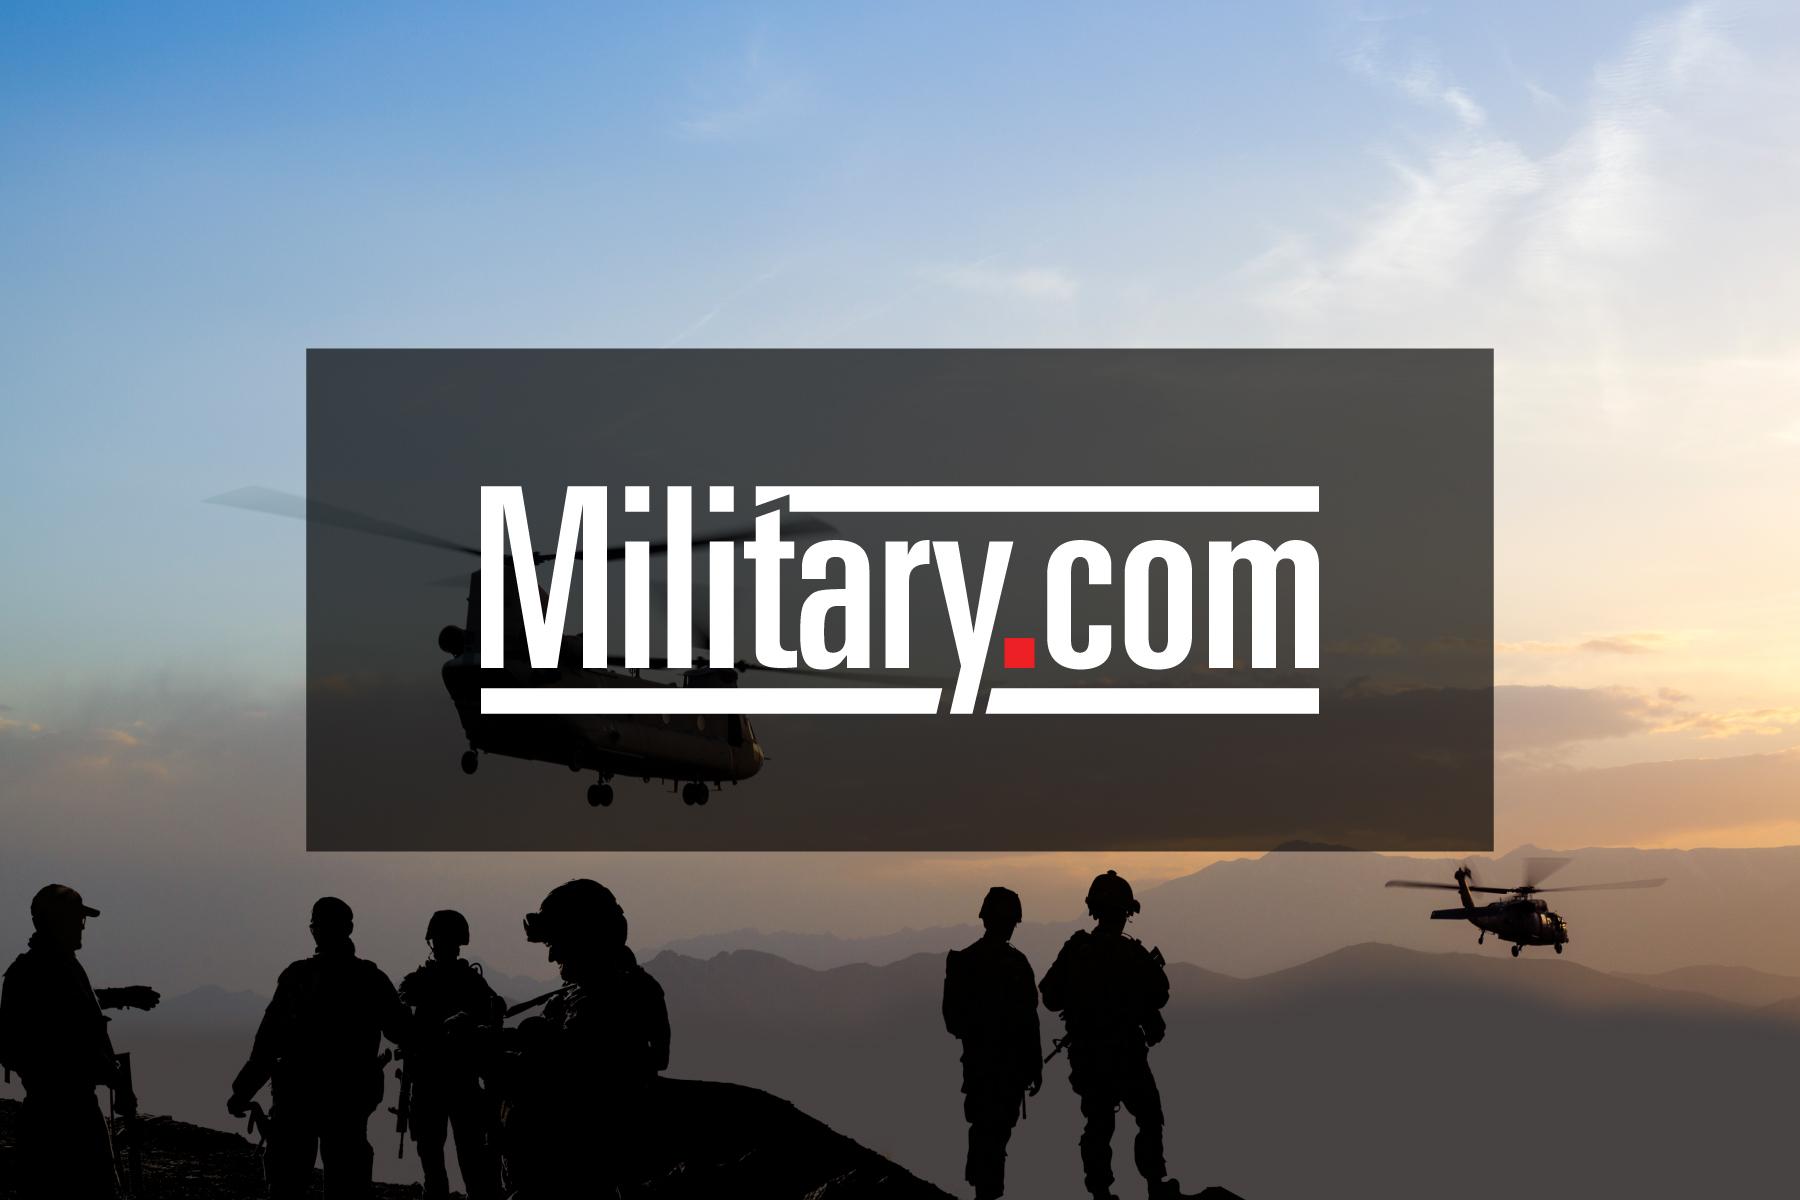 US Aircraft Carrier Patrols Disputed Sea amid China Buildup